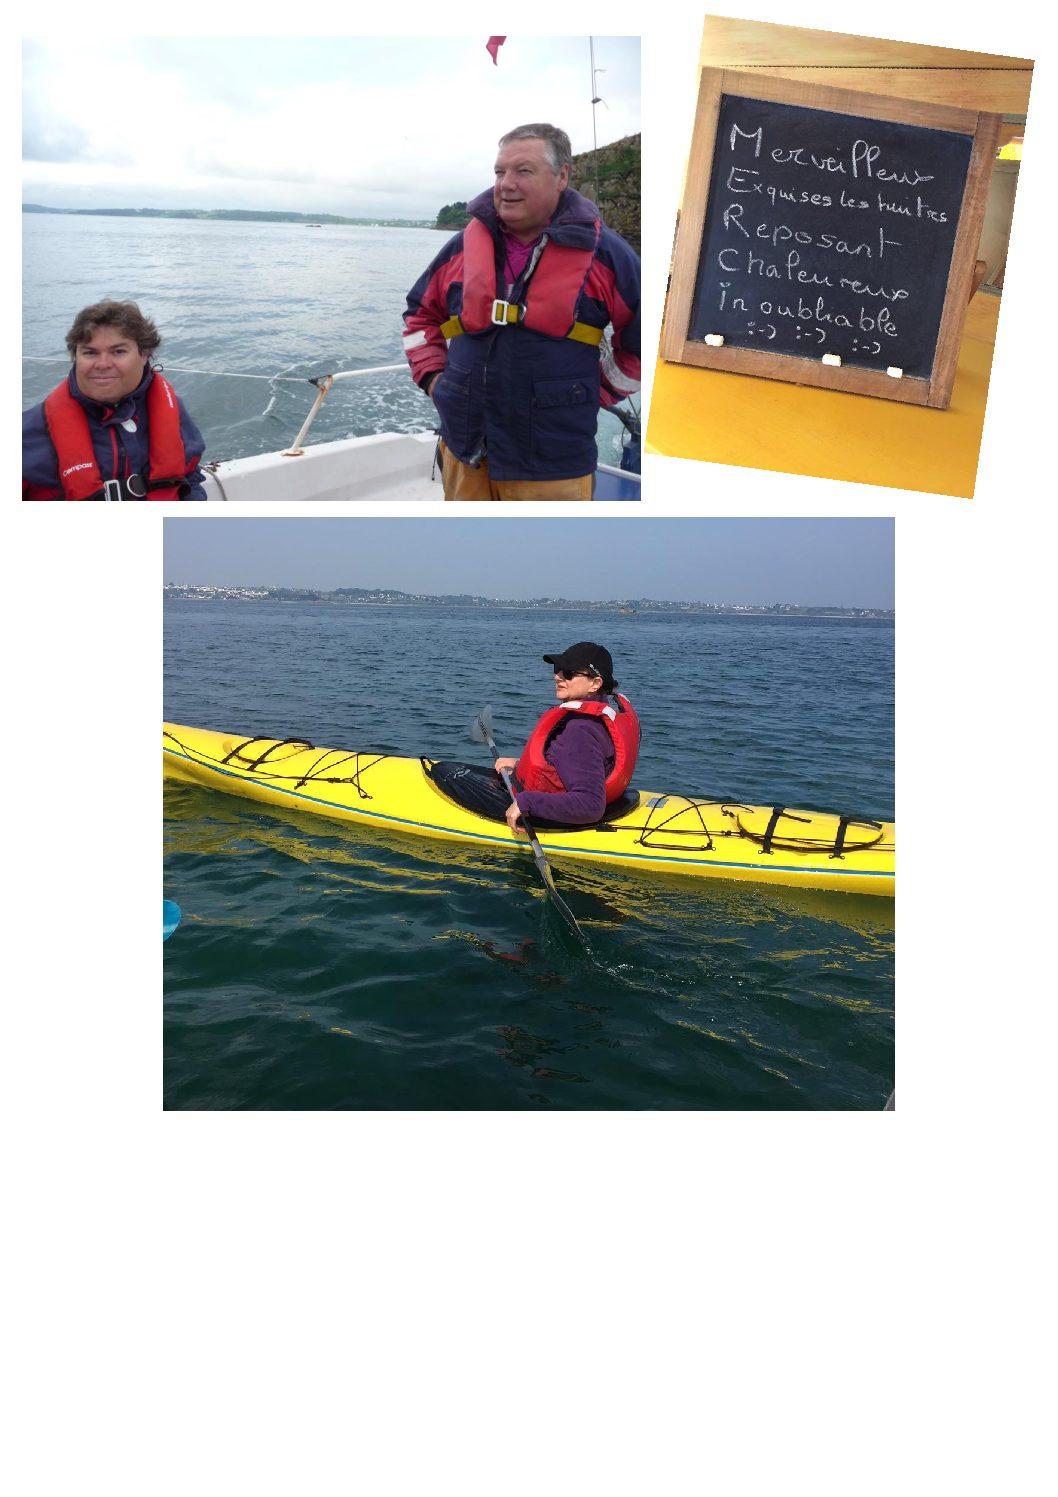 2 semaines de rêve en baie de Morlaix en mai 2018